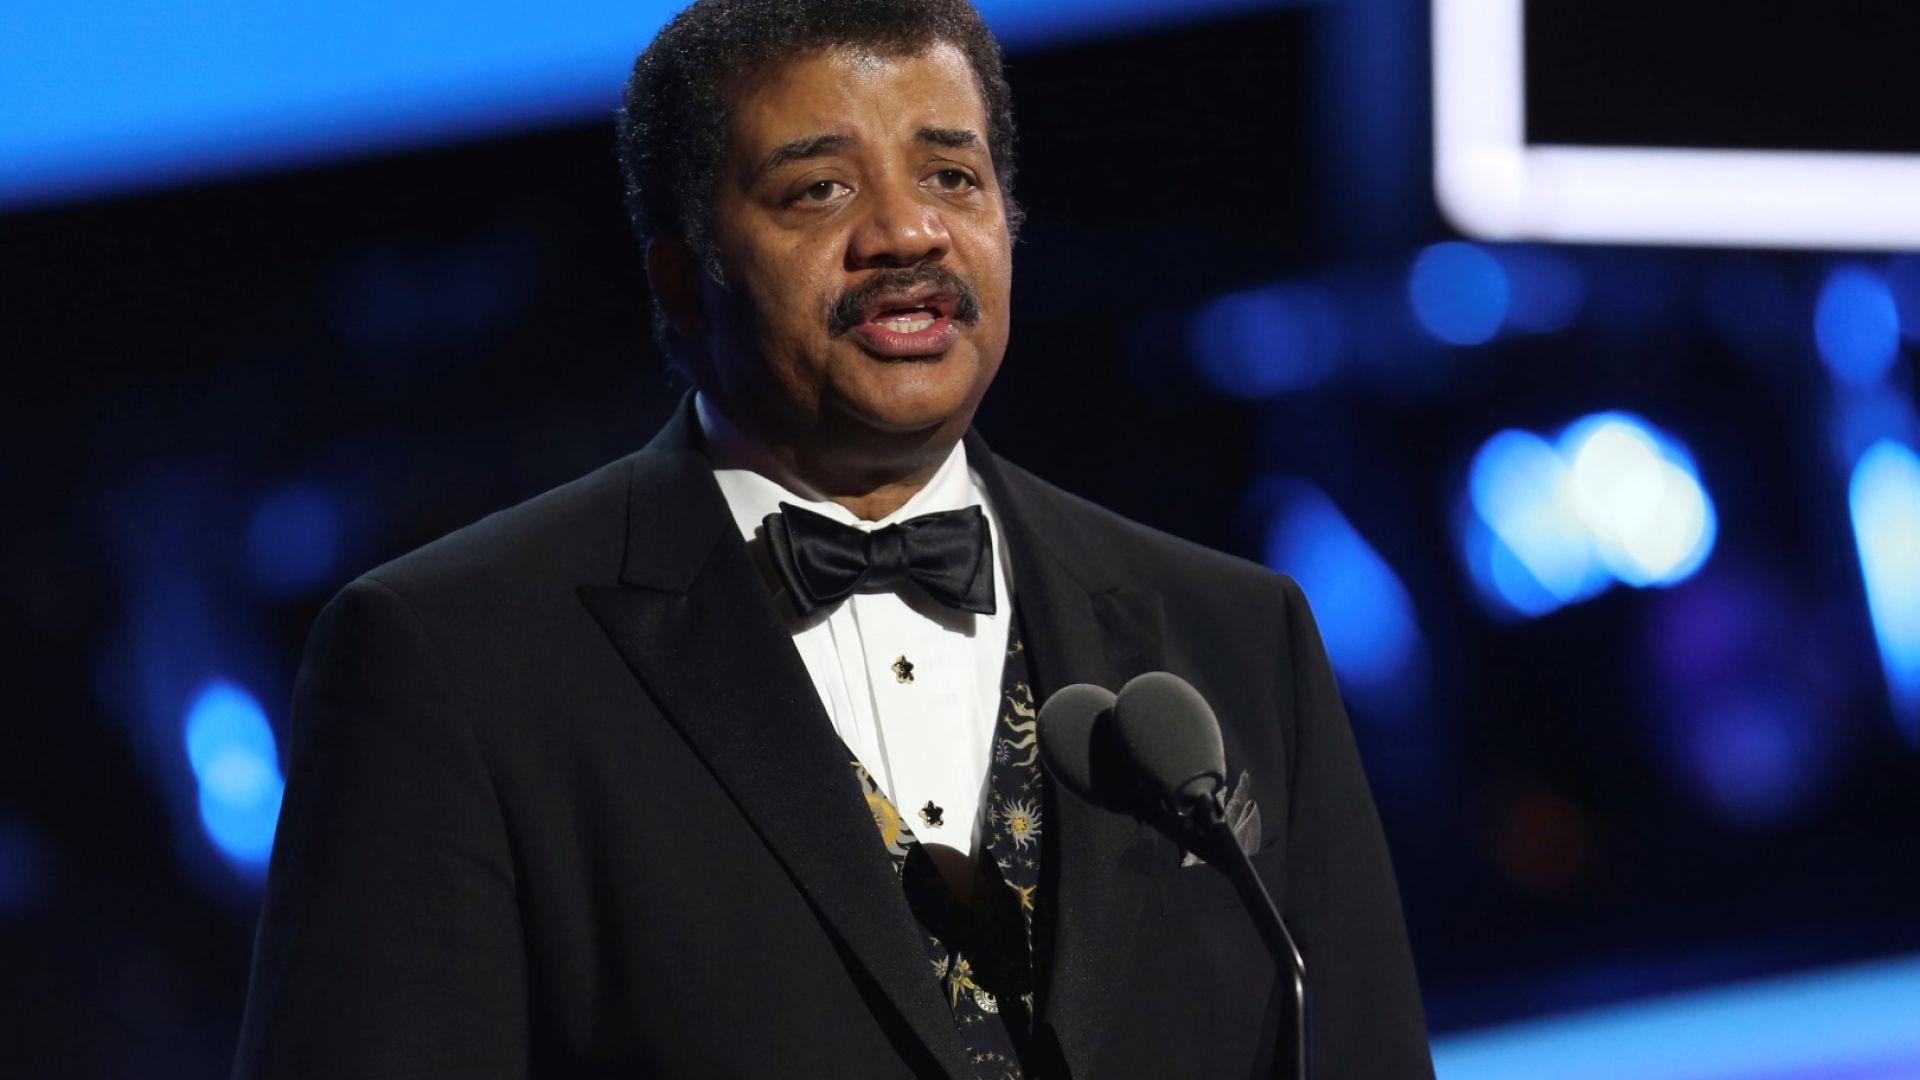 """Нешънъл джиографик"" спря шоуто на астрофизика Нийл Деграс Тайсън"